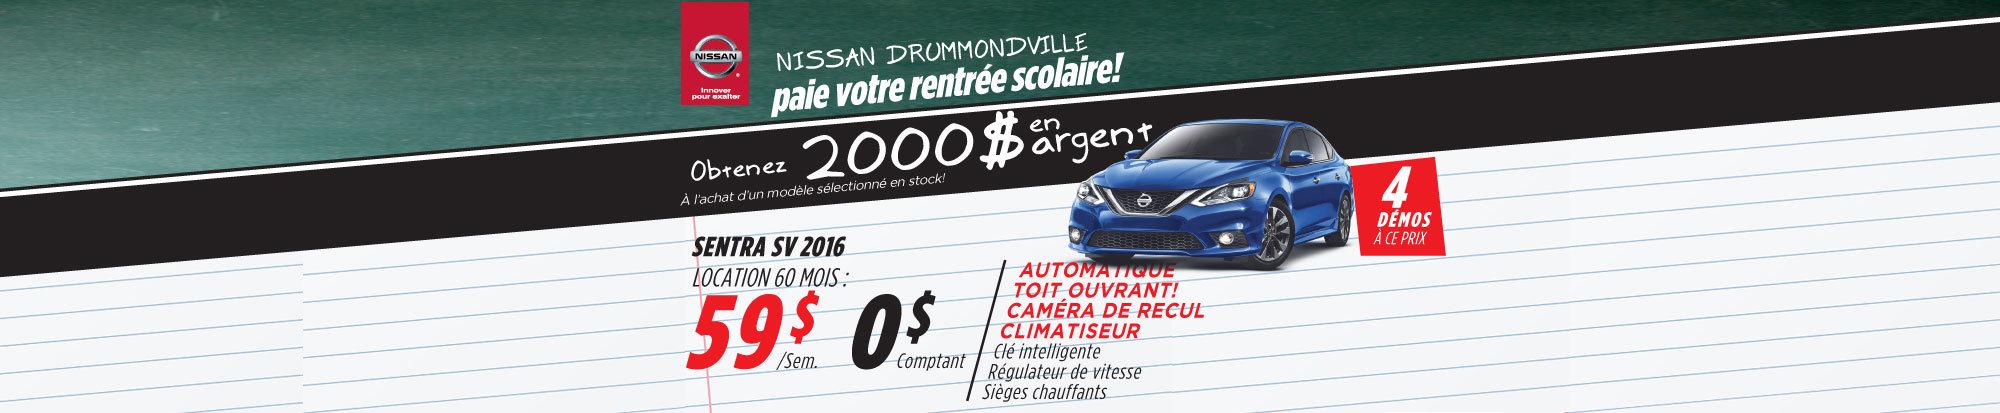 La liquidation top chrono de Nissan  - Sentra 2016 Drummondville